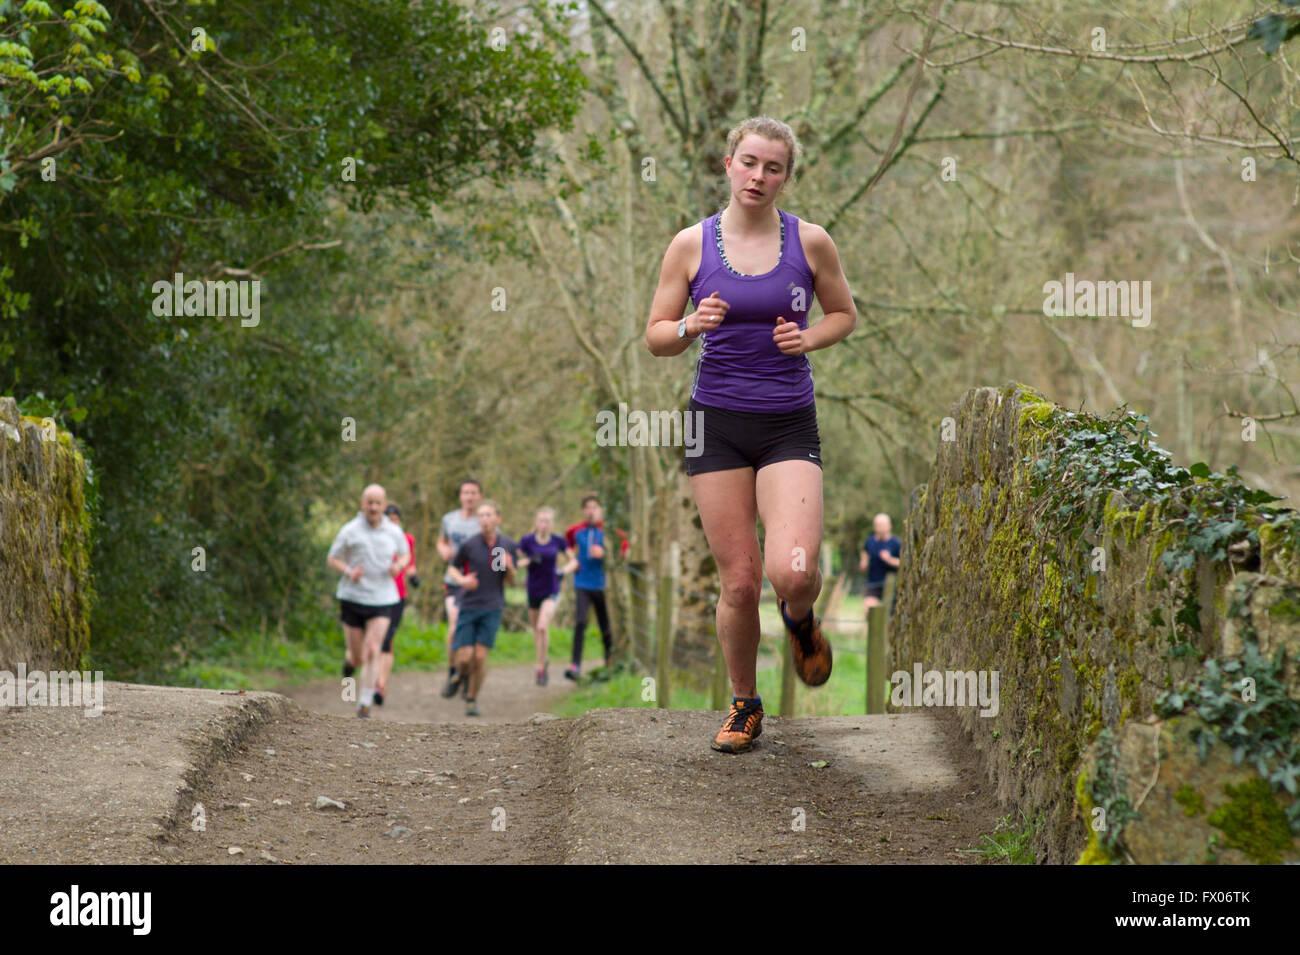 Bovey Tracey, Devon, UK. 09th Apr, 2016. Parke 5 kilometer fun run at Parke Dartmoor National Park HQ Bovey Tracey - Stock Image